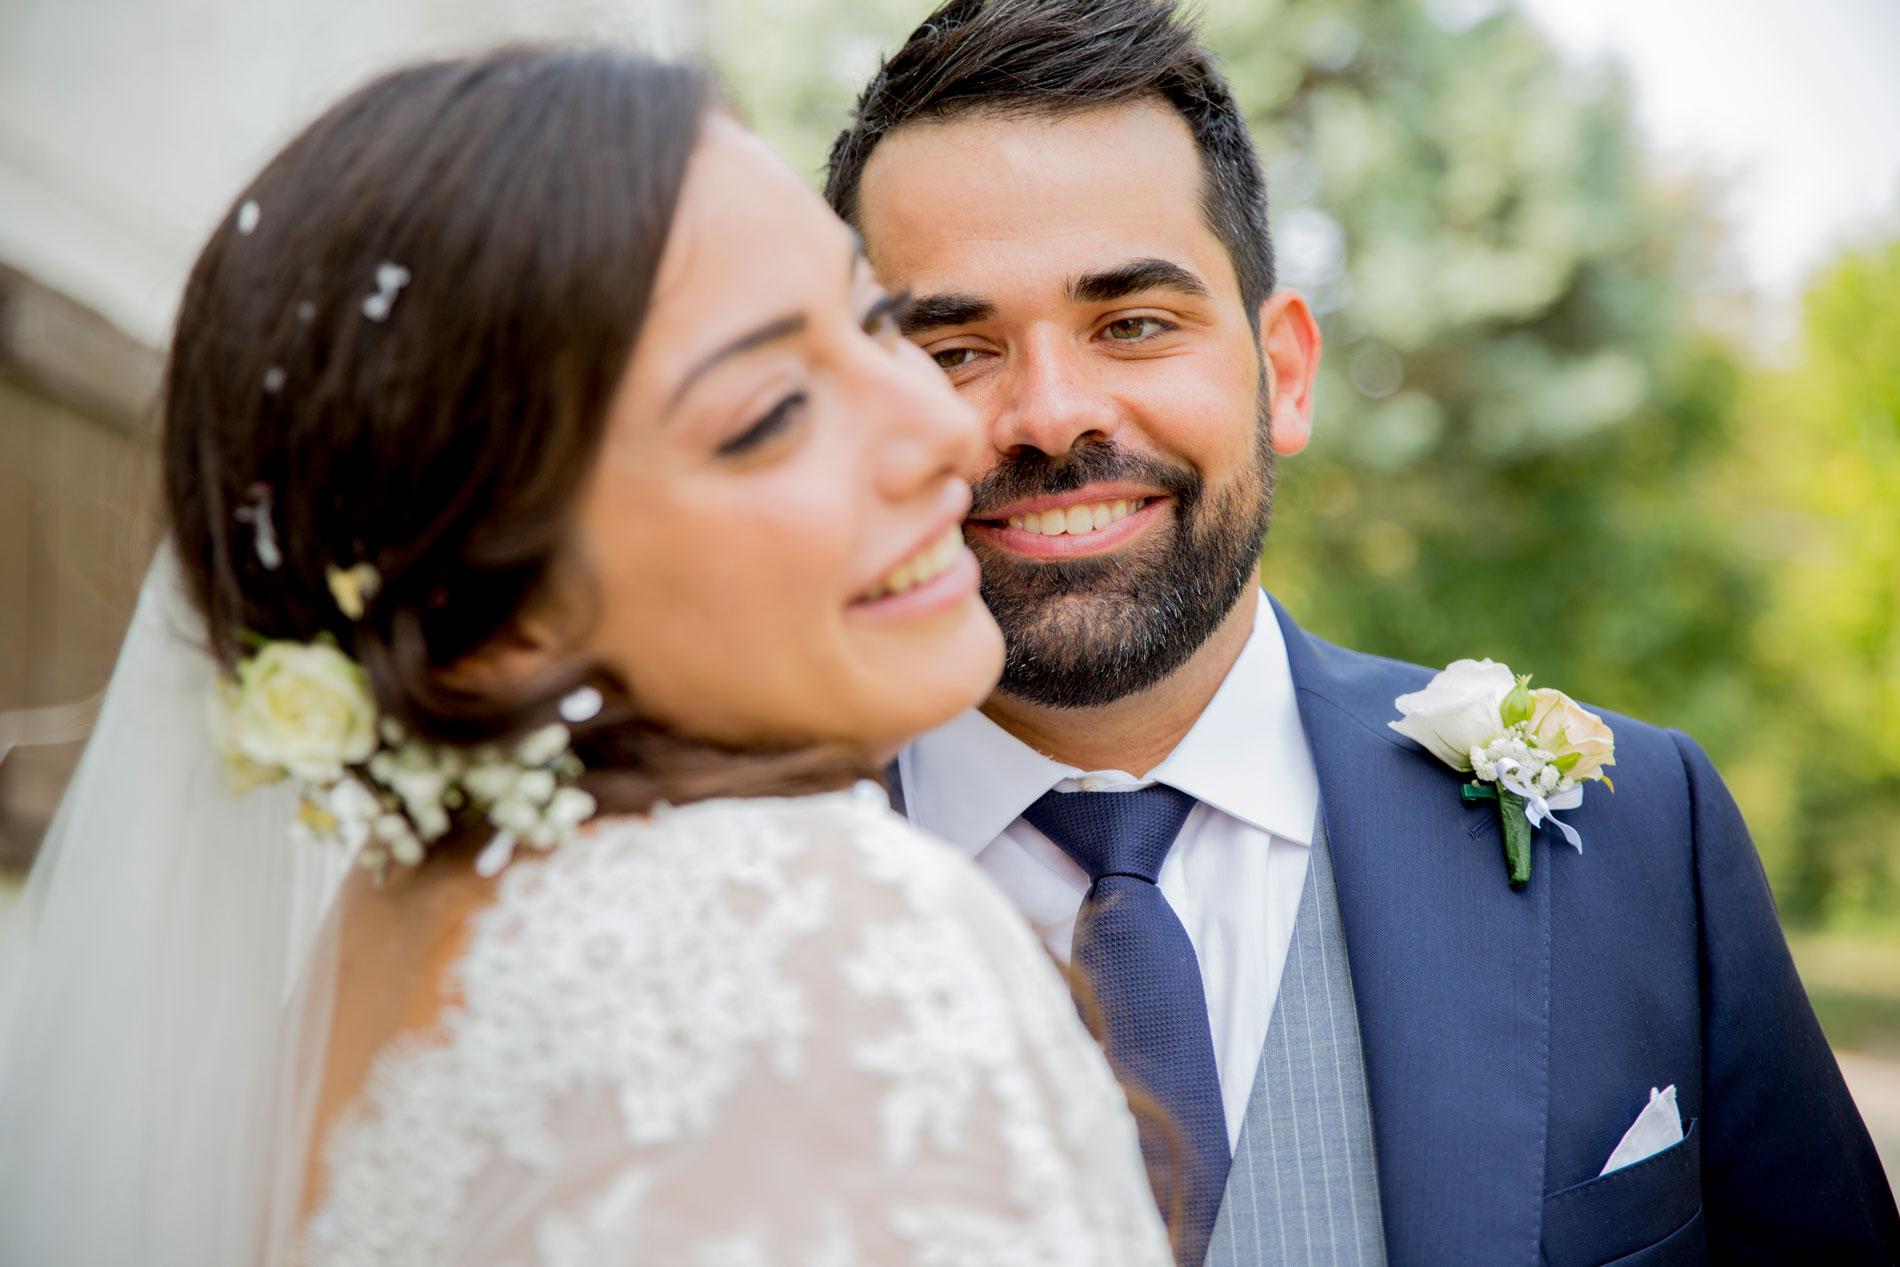 ivano-di-maria-wedding-photographer-giu-eman-11